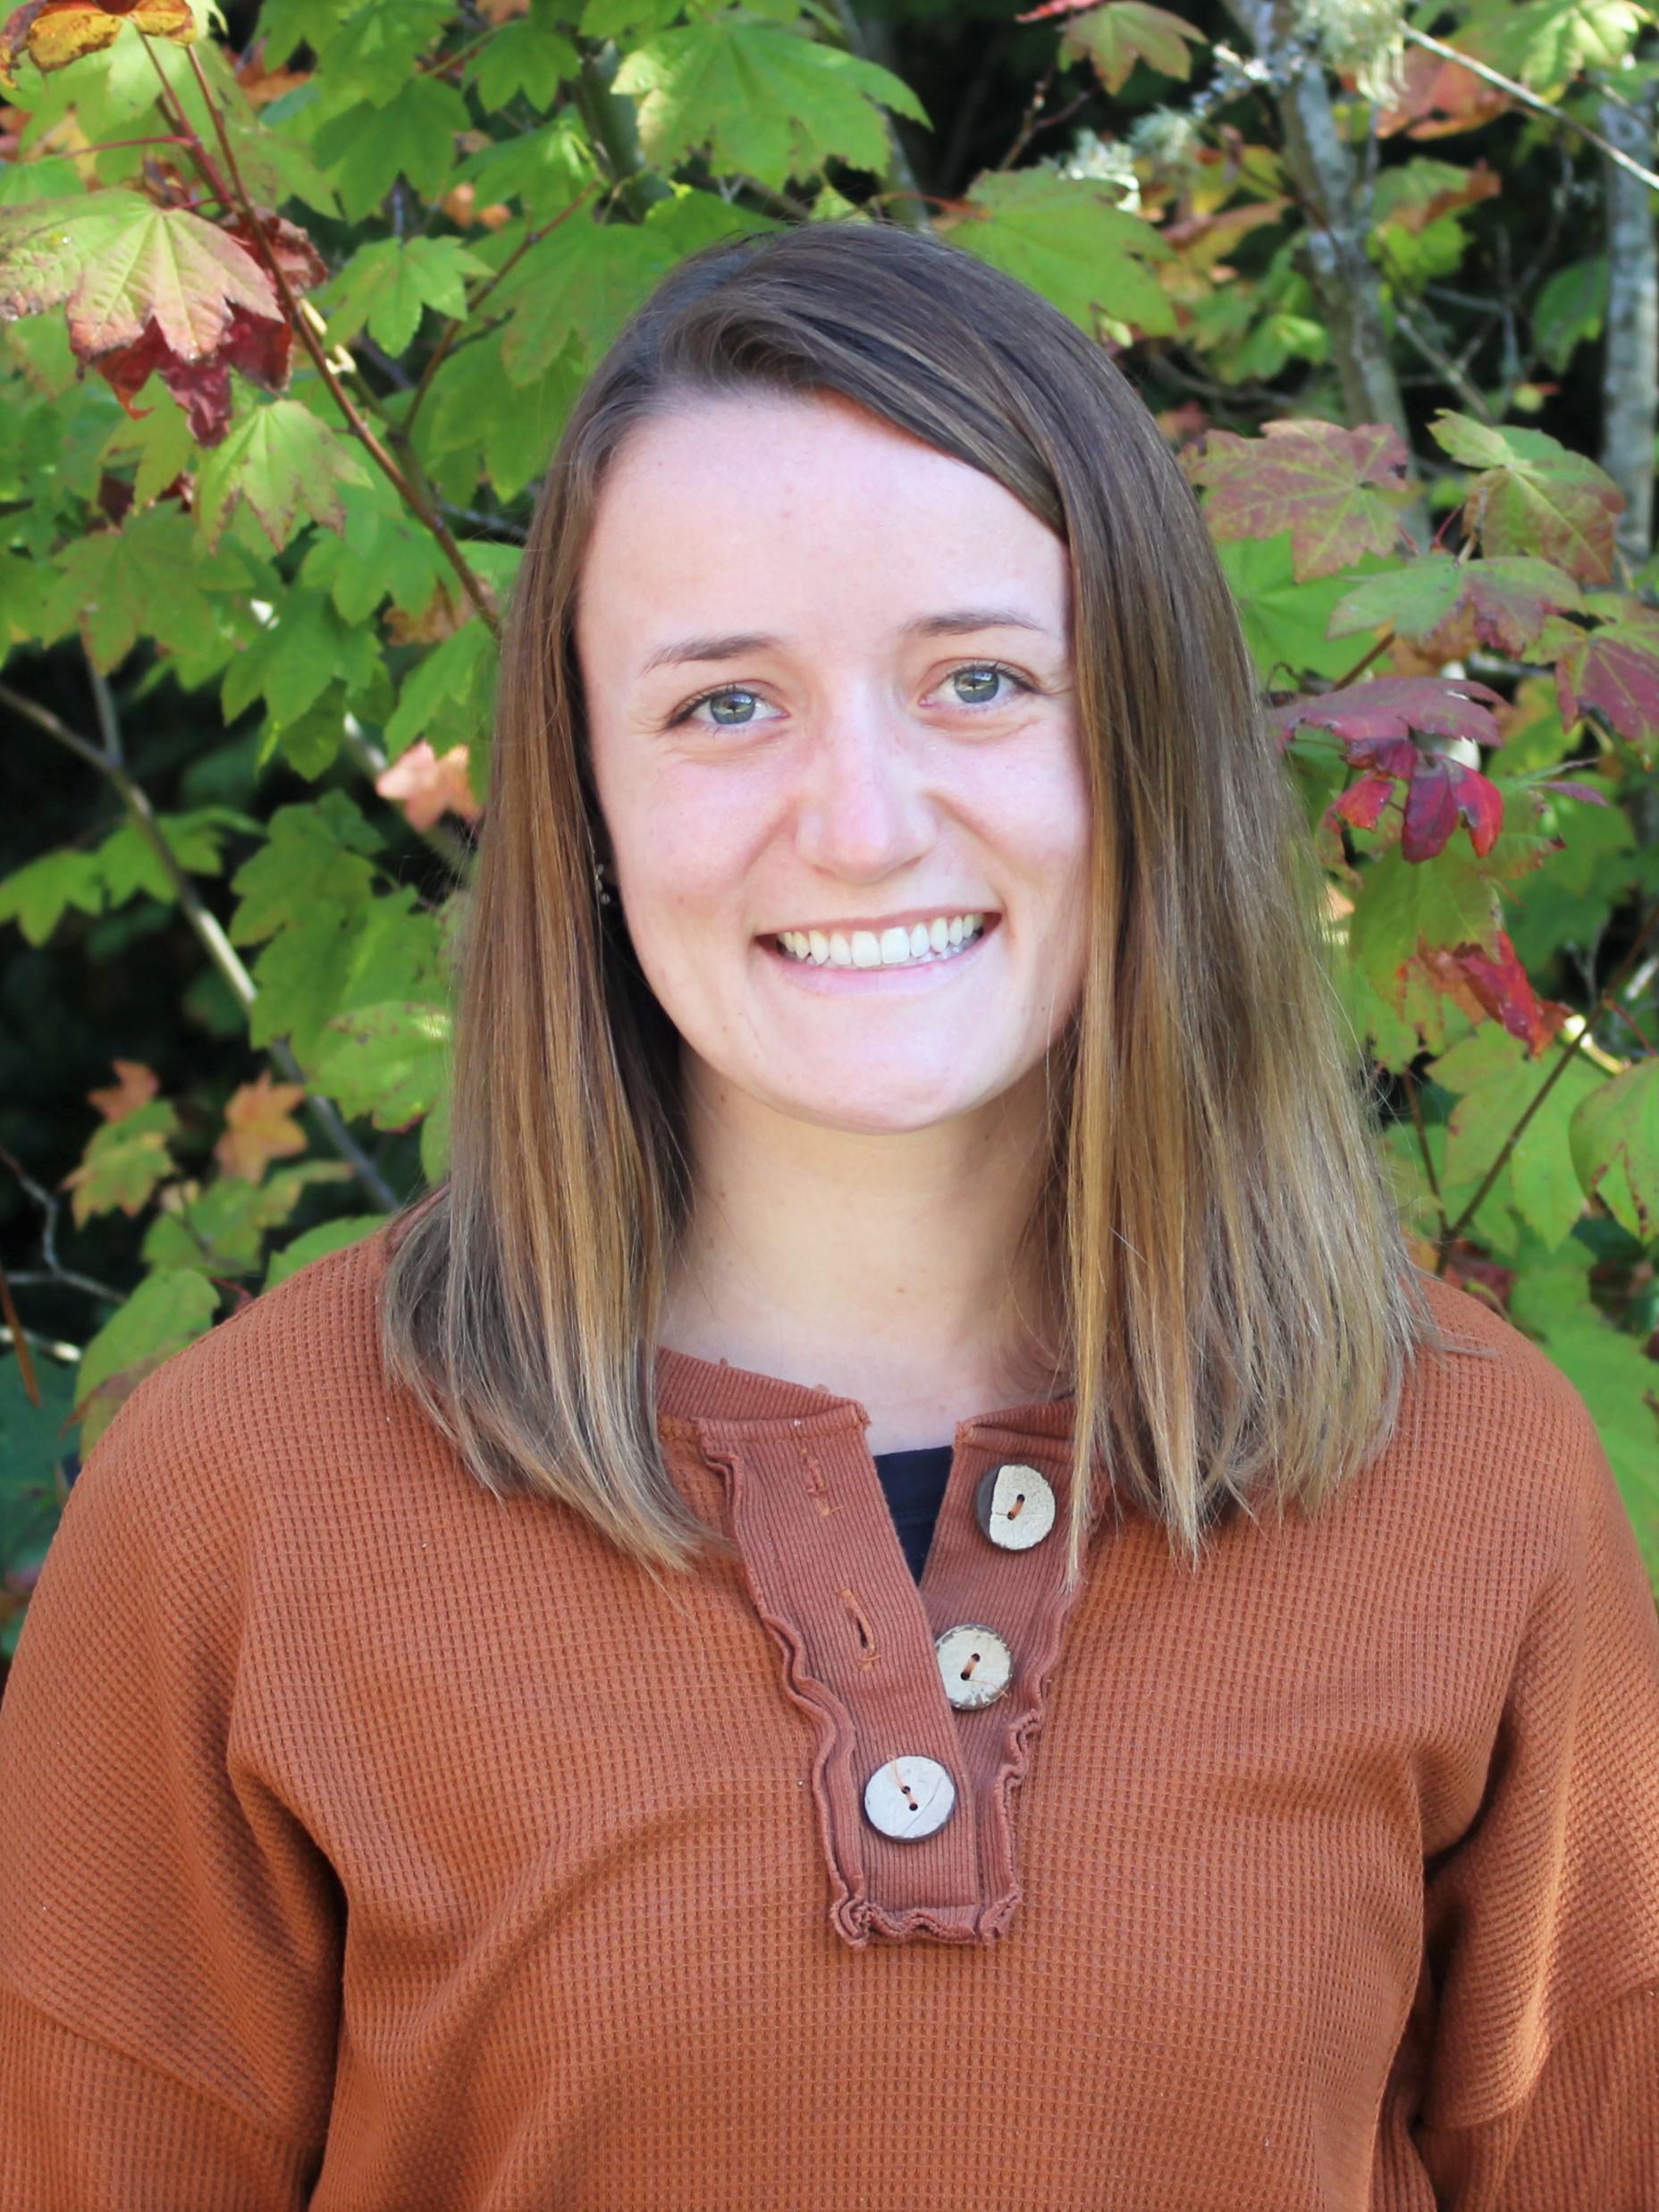 IslandWood Graduate Program student Megan Wing